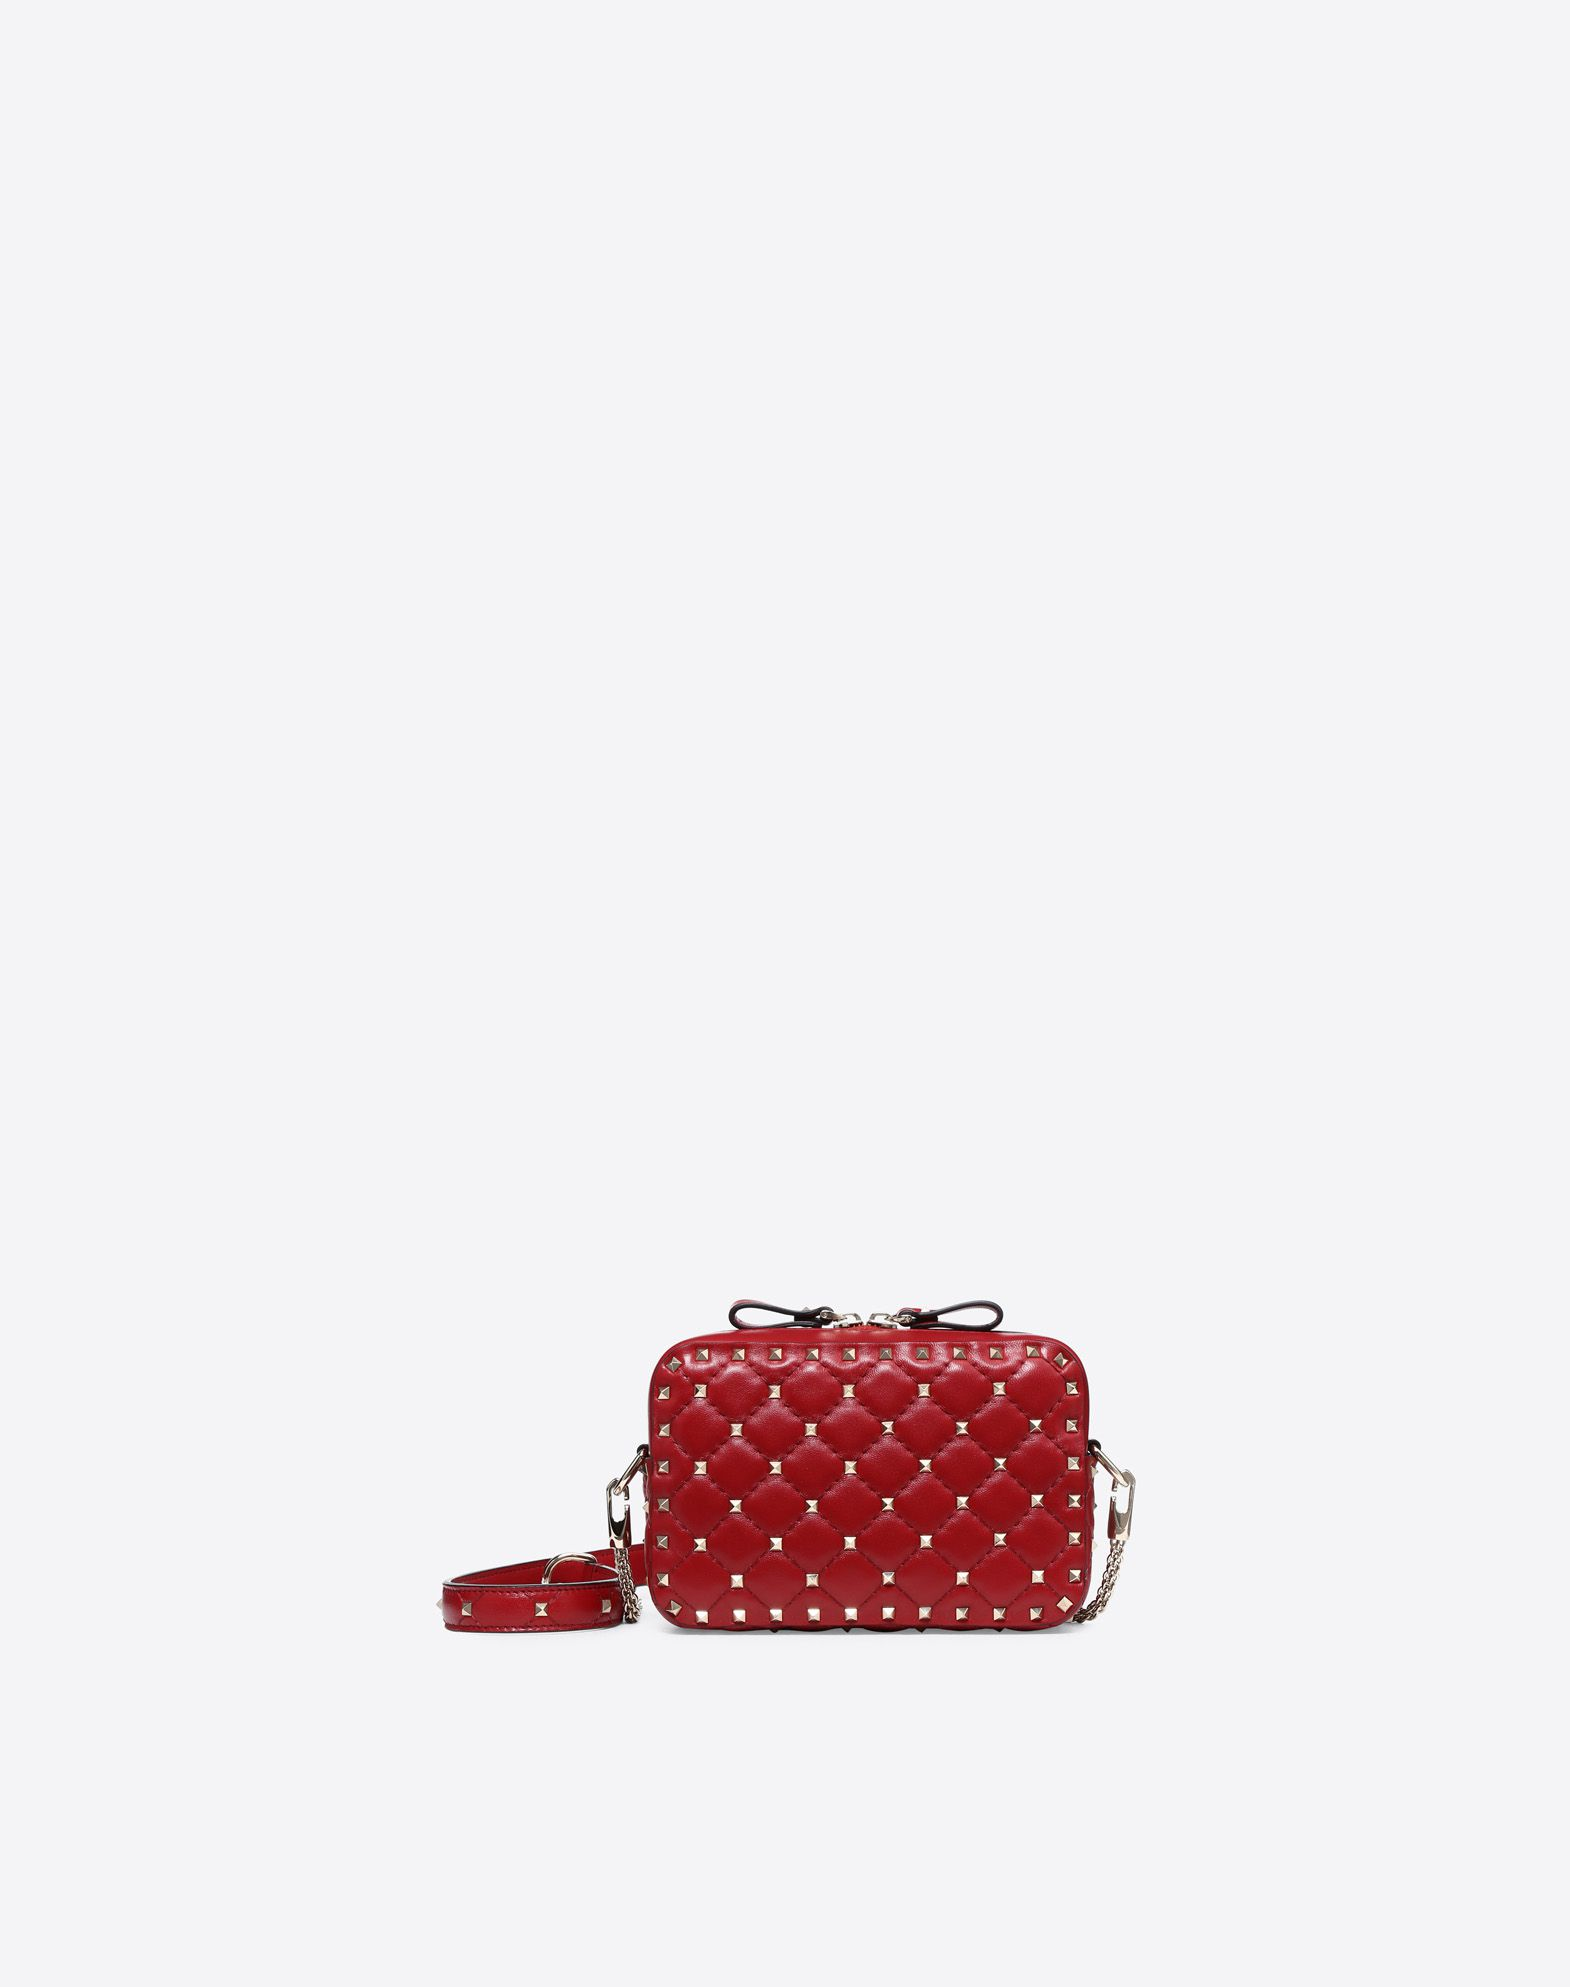 VALENTINO GARAVANI Rockstud Spike Cross Body Bag CROSS BODY BAG D f